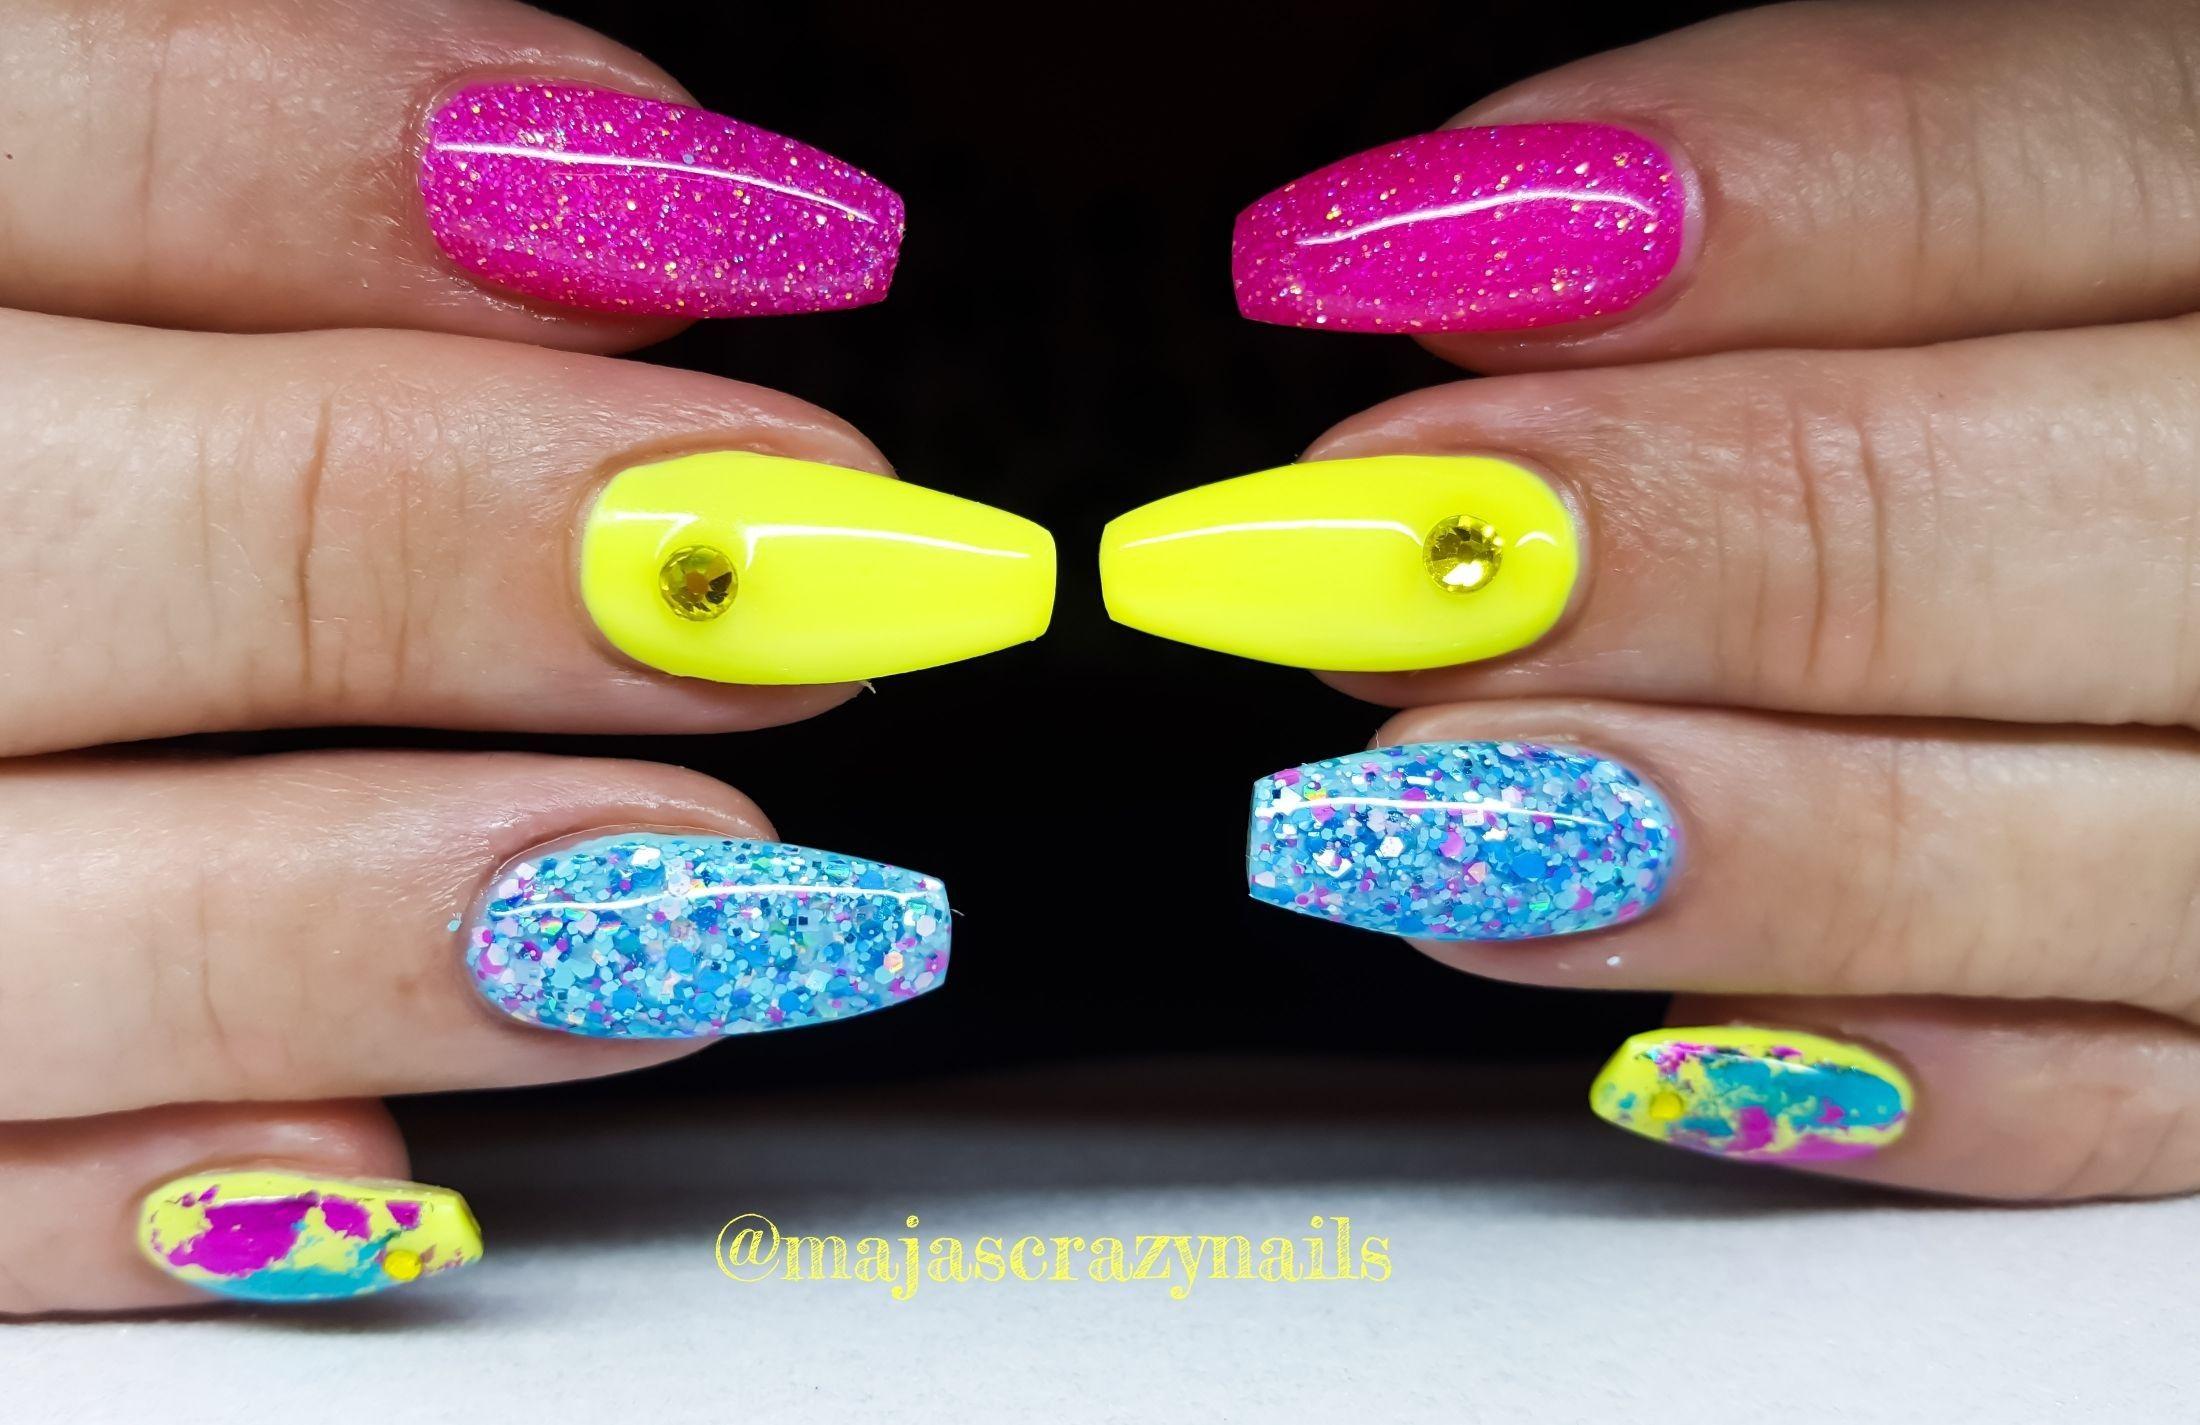 Pin by Maja Granberg on Miss Crazy Nails Design | Pinterest | Crazy ...